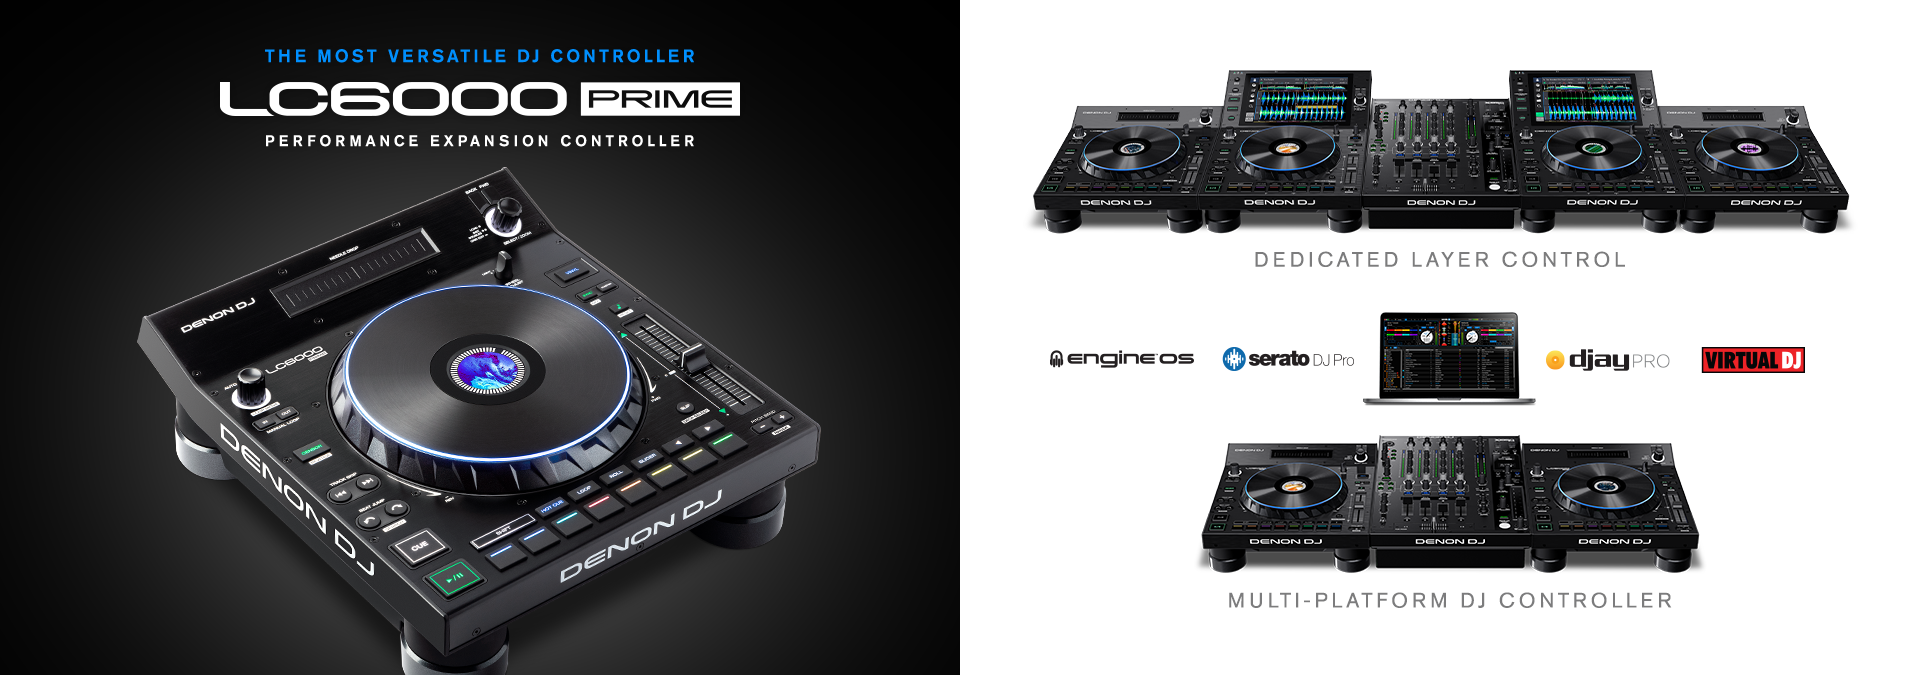 LC6000 Prime Performance扩展控制器已发布